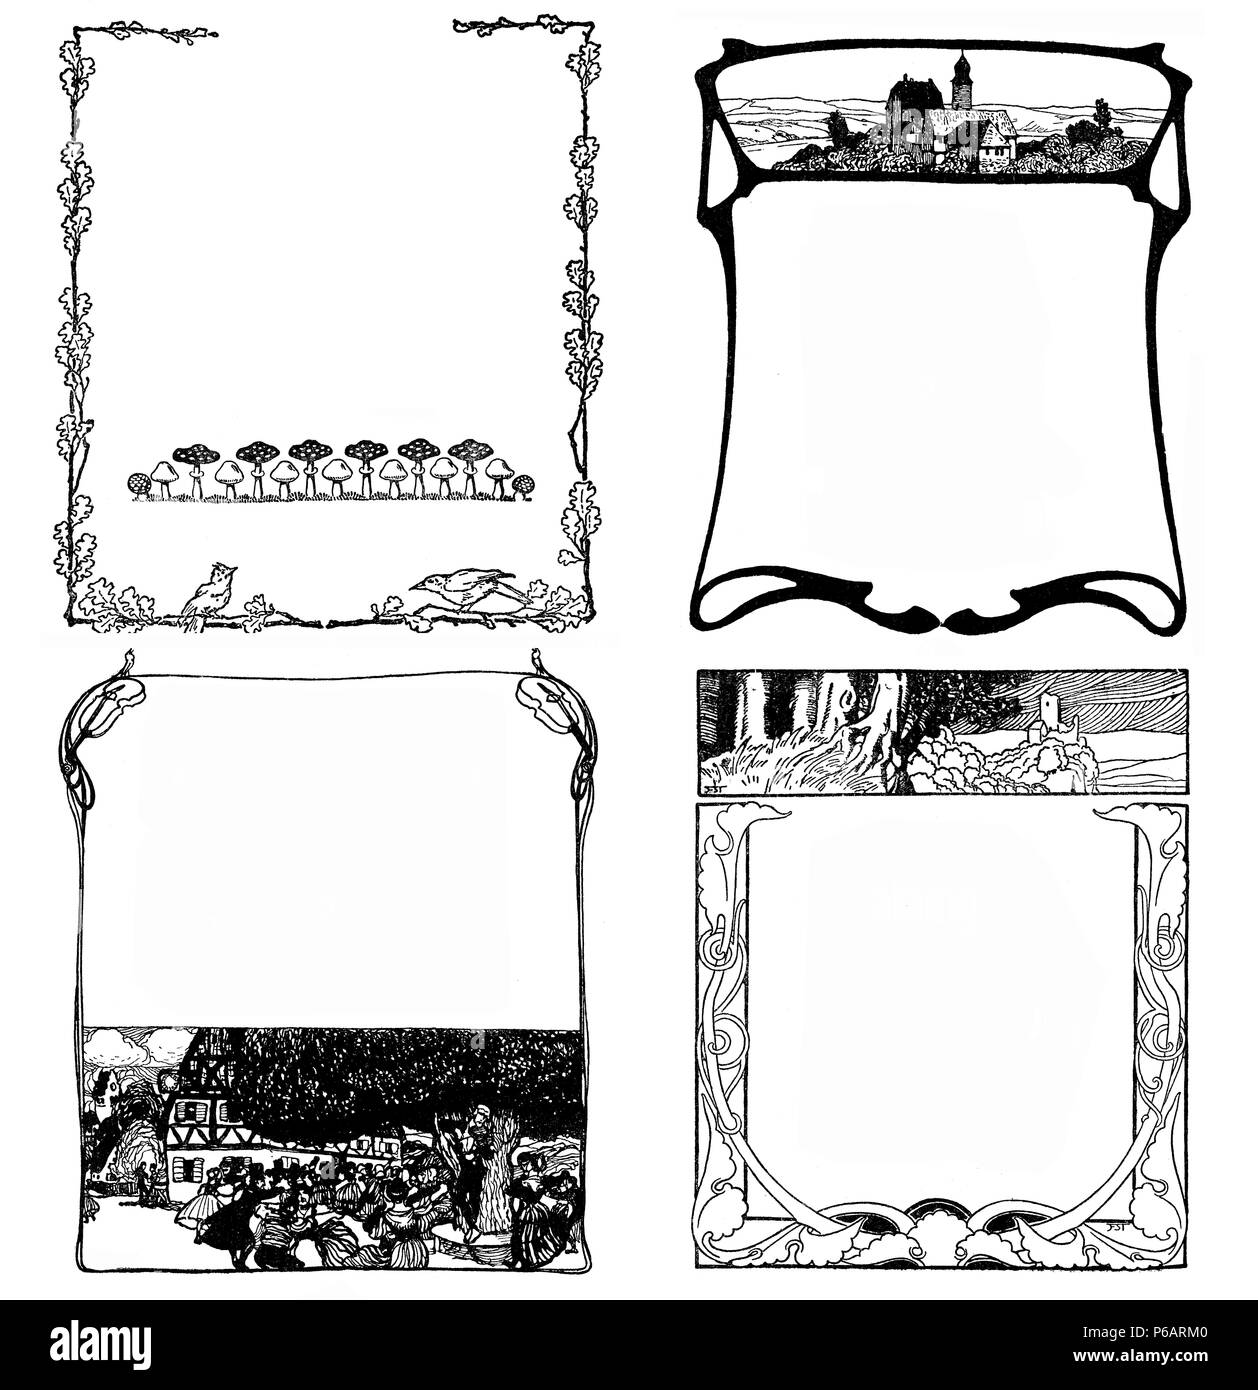 Vector Set Of Vintage Elements For Design Frames Stock Photos ...